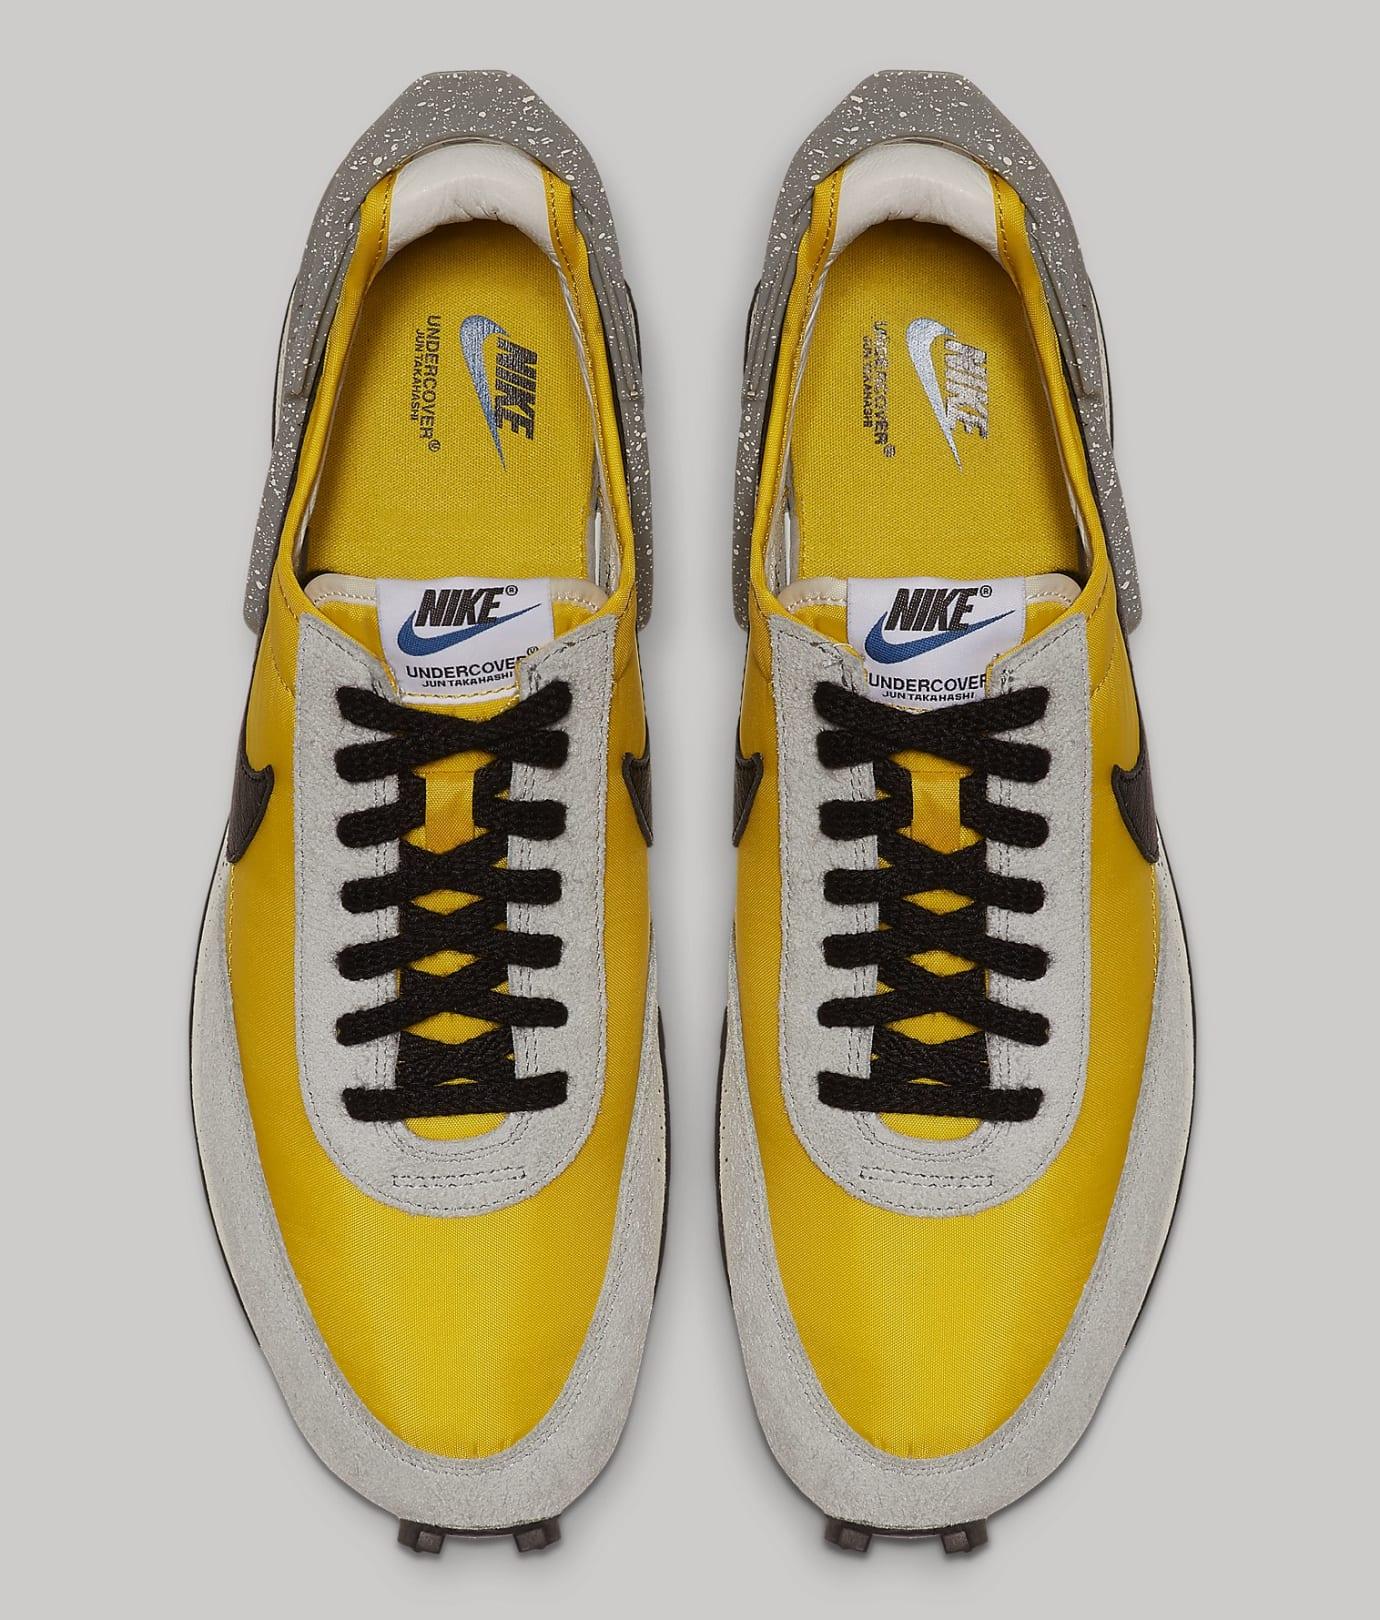 Undercover x Nike Daybreak Bright Citron/Black-Summit White BV4594-700 Top